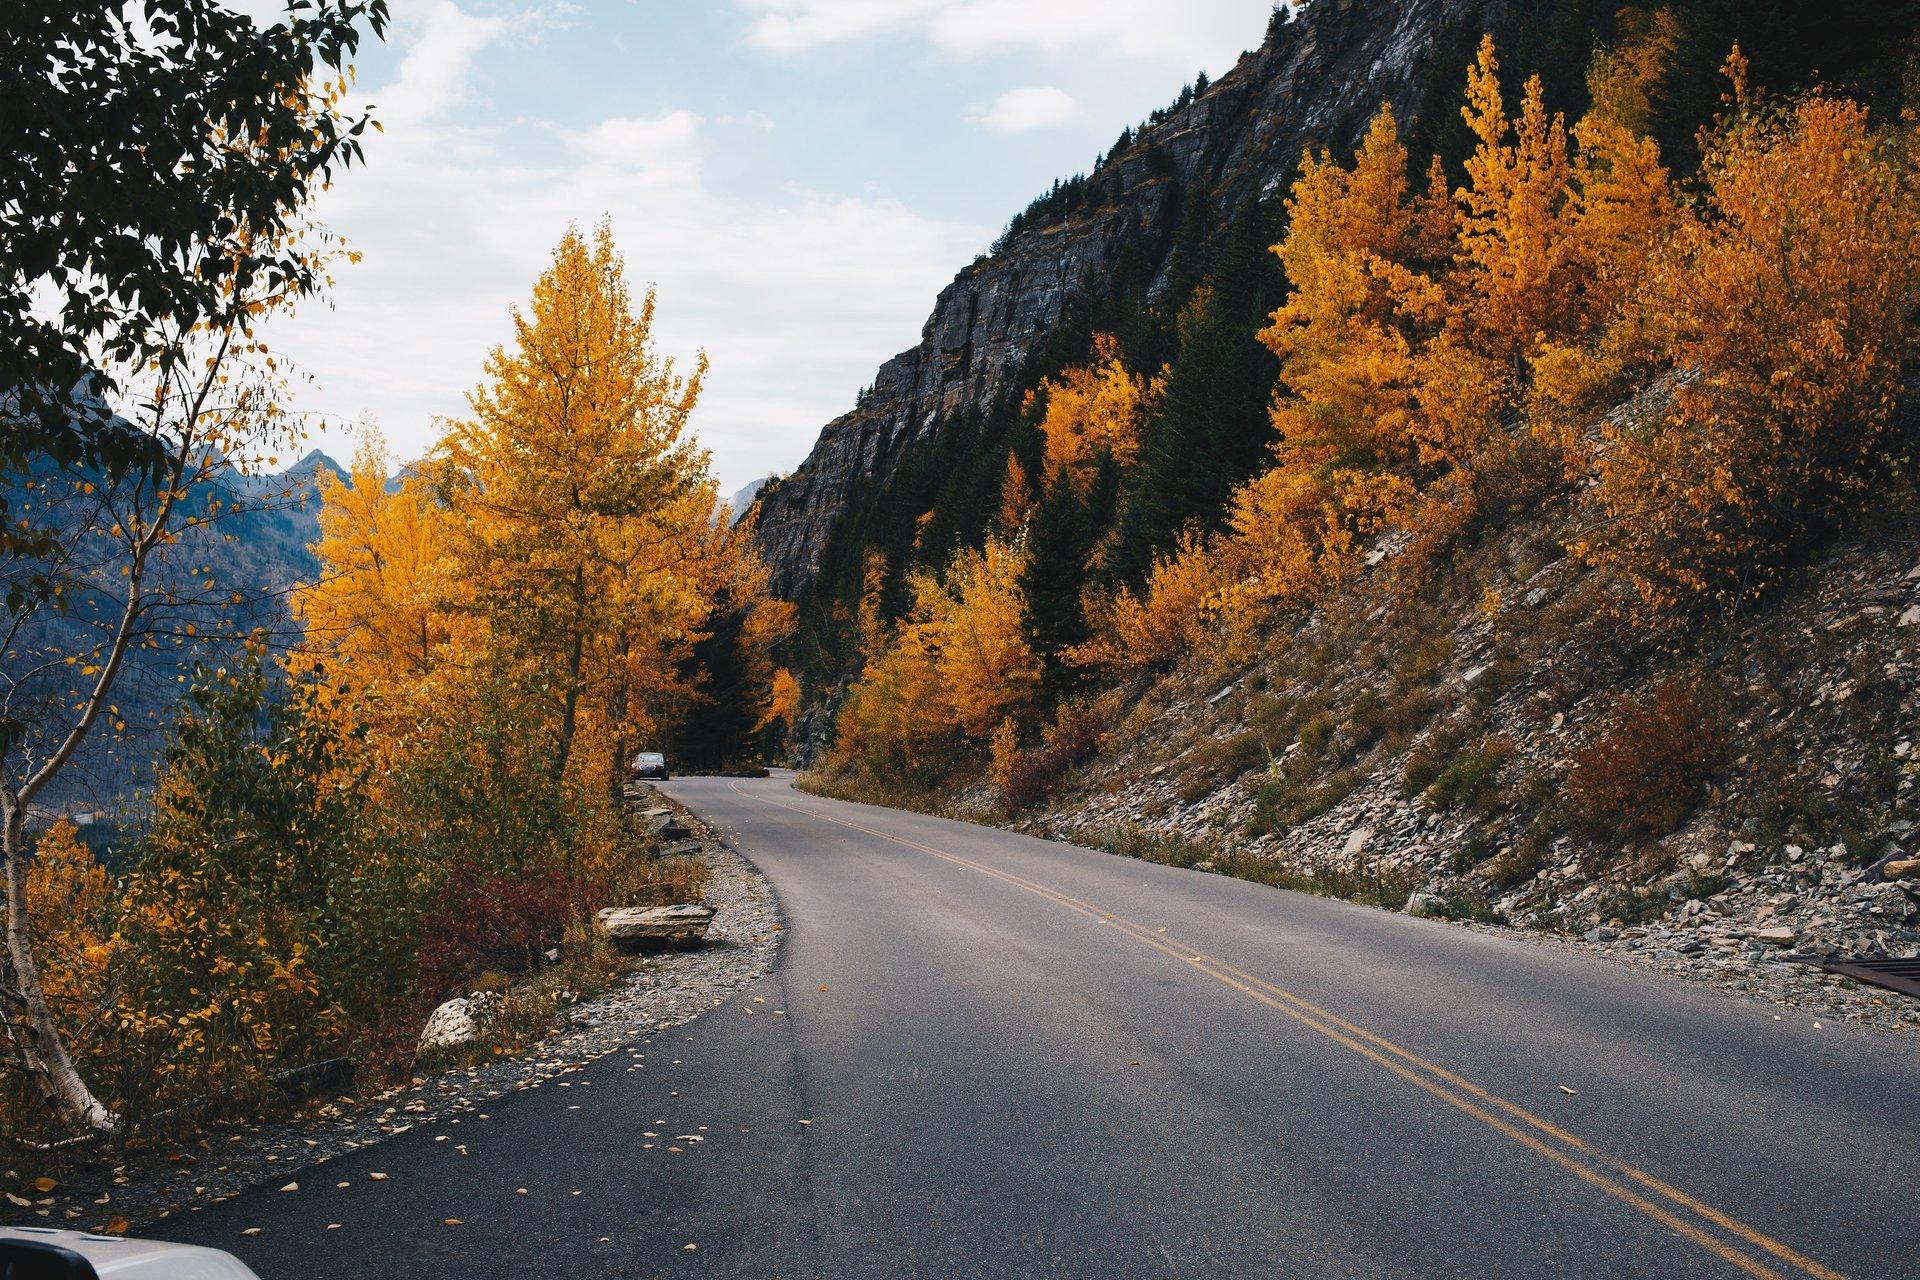 Fall colors along the Sun Road 2020